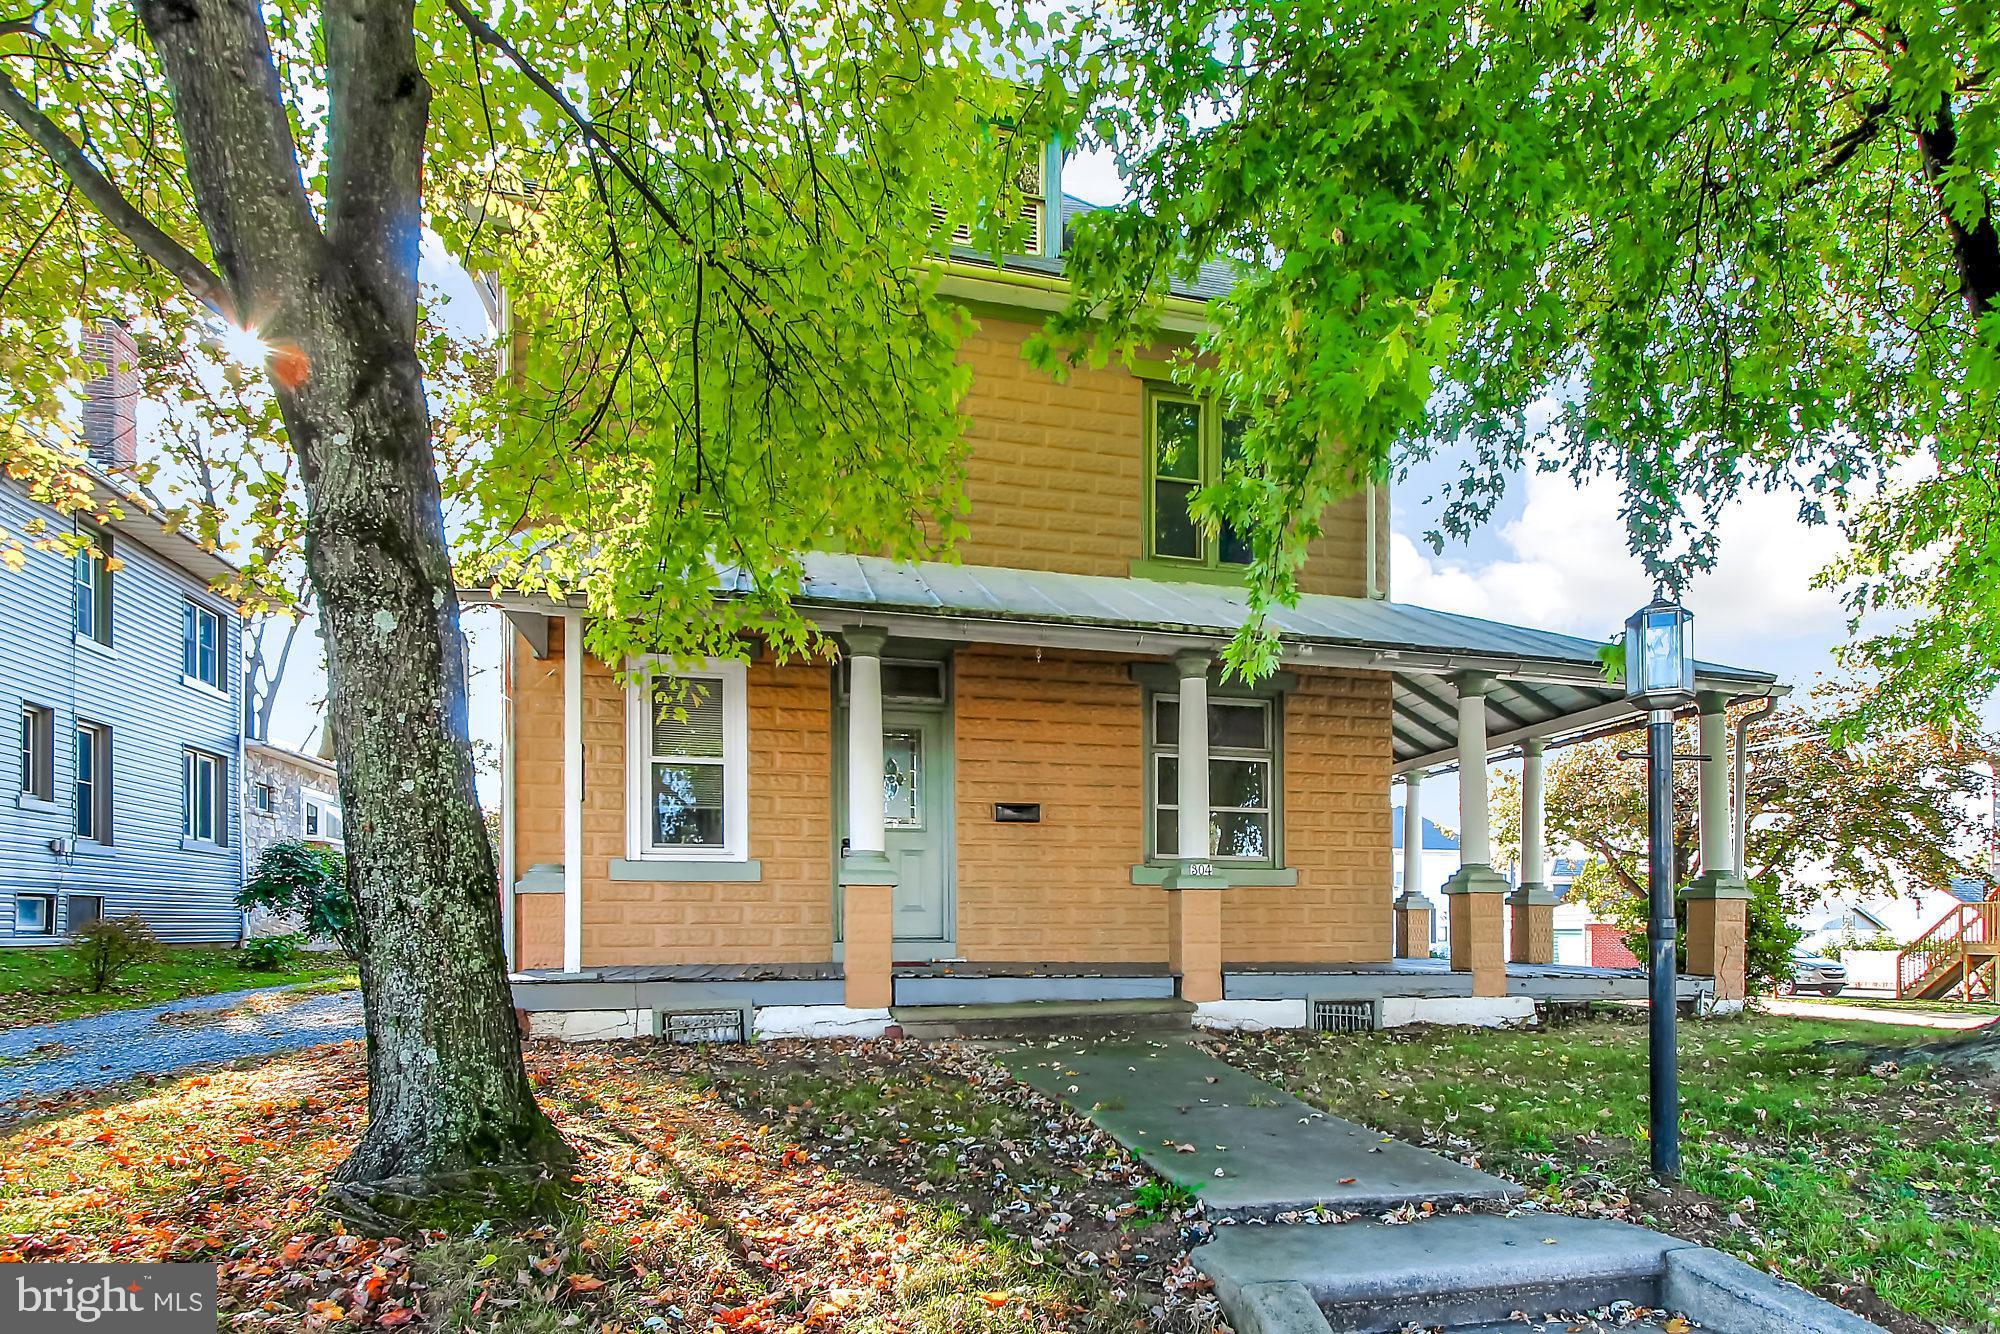 304 S HOME AVENUE, TOPTON, PA 19562